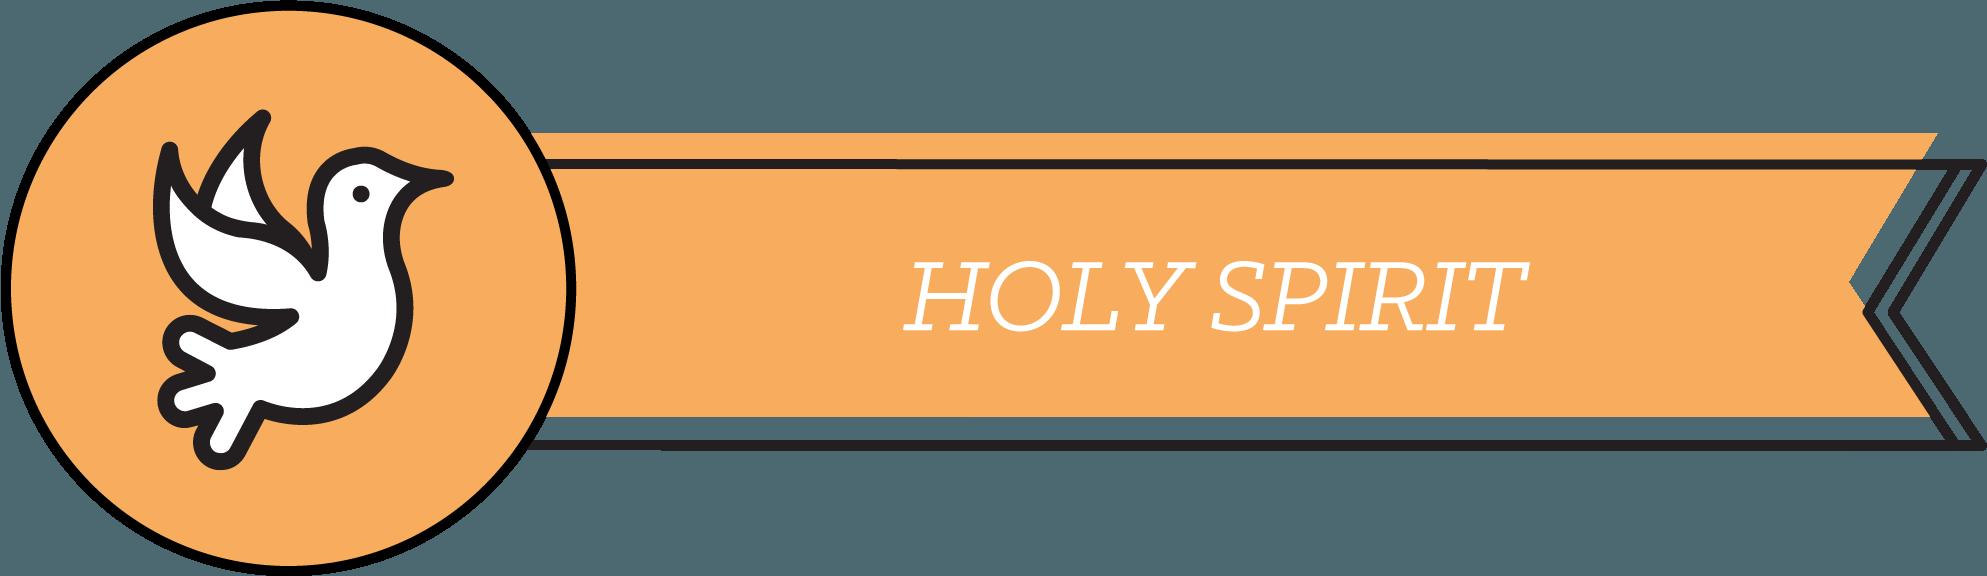 Holy Spirit Concept